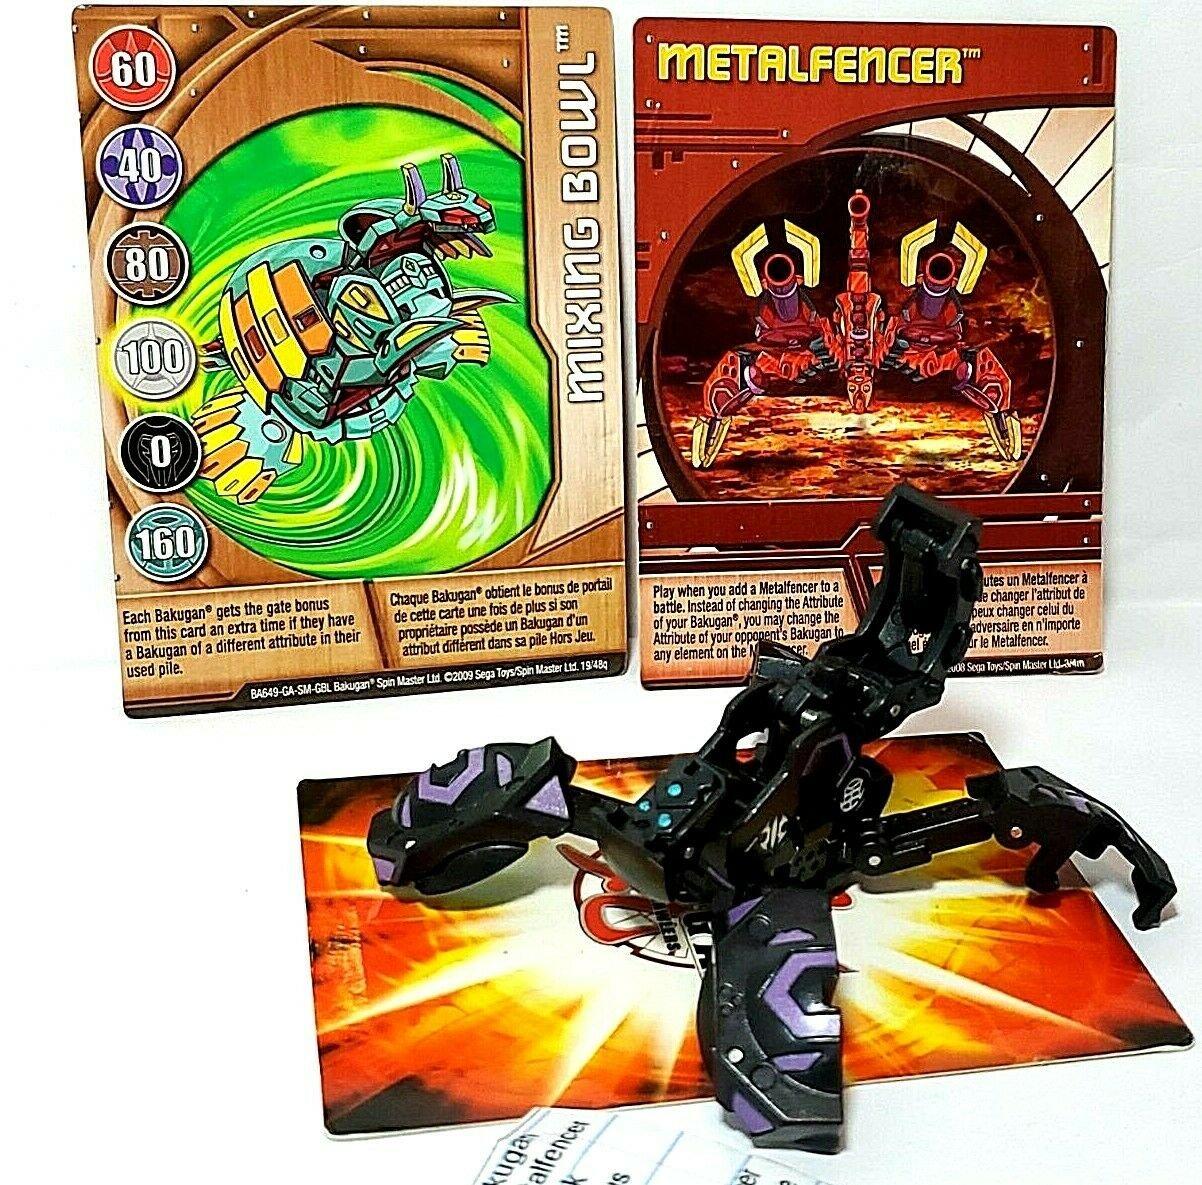 Bakugan Metalfencer Black Darkus Aquos Ventus, metalfencer card 3 piece lot